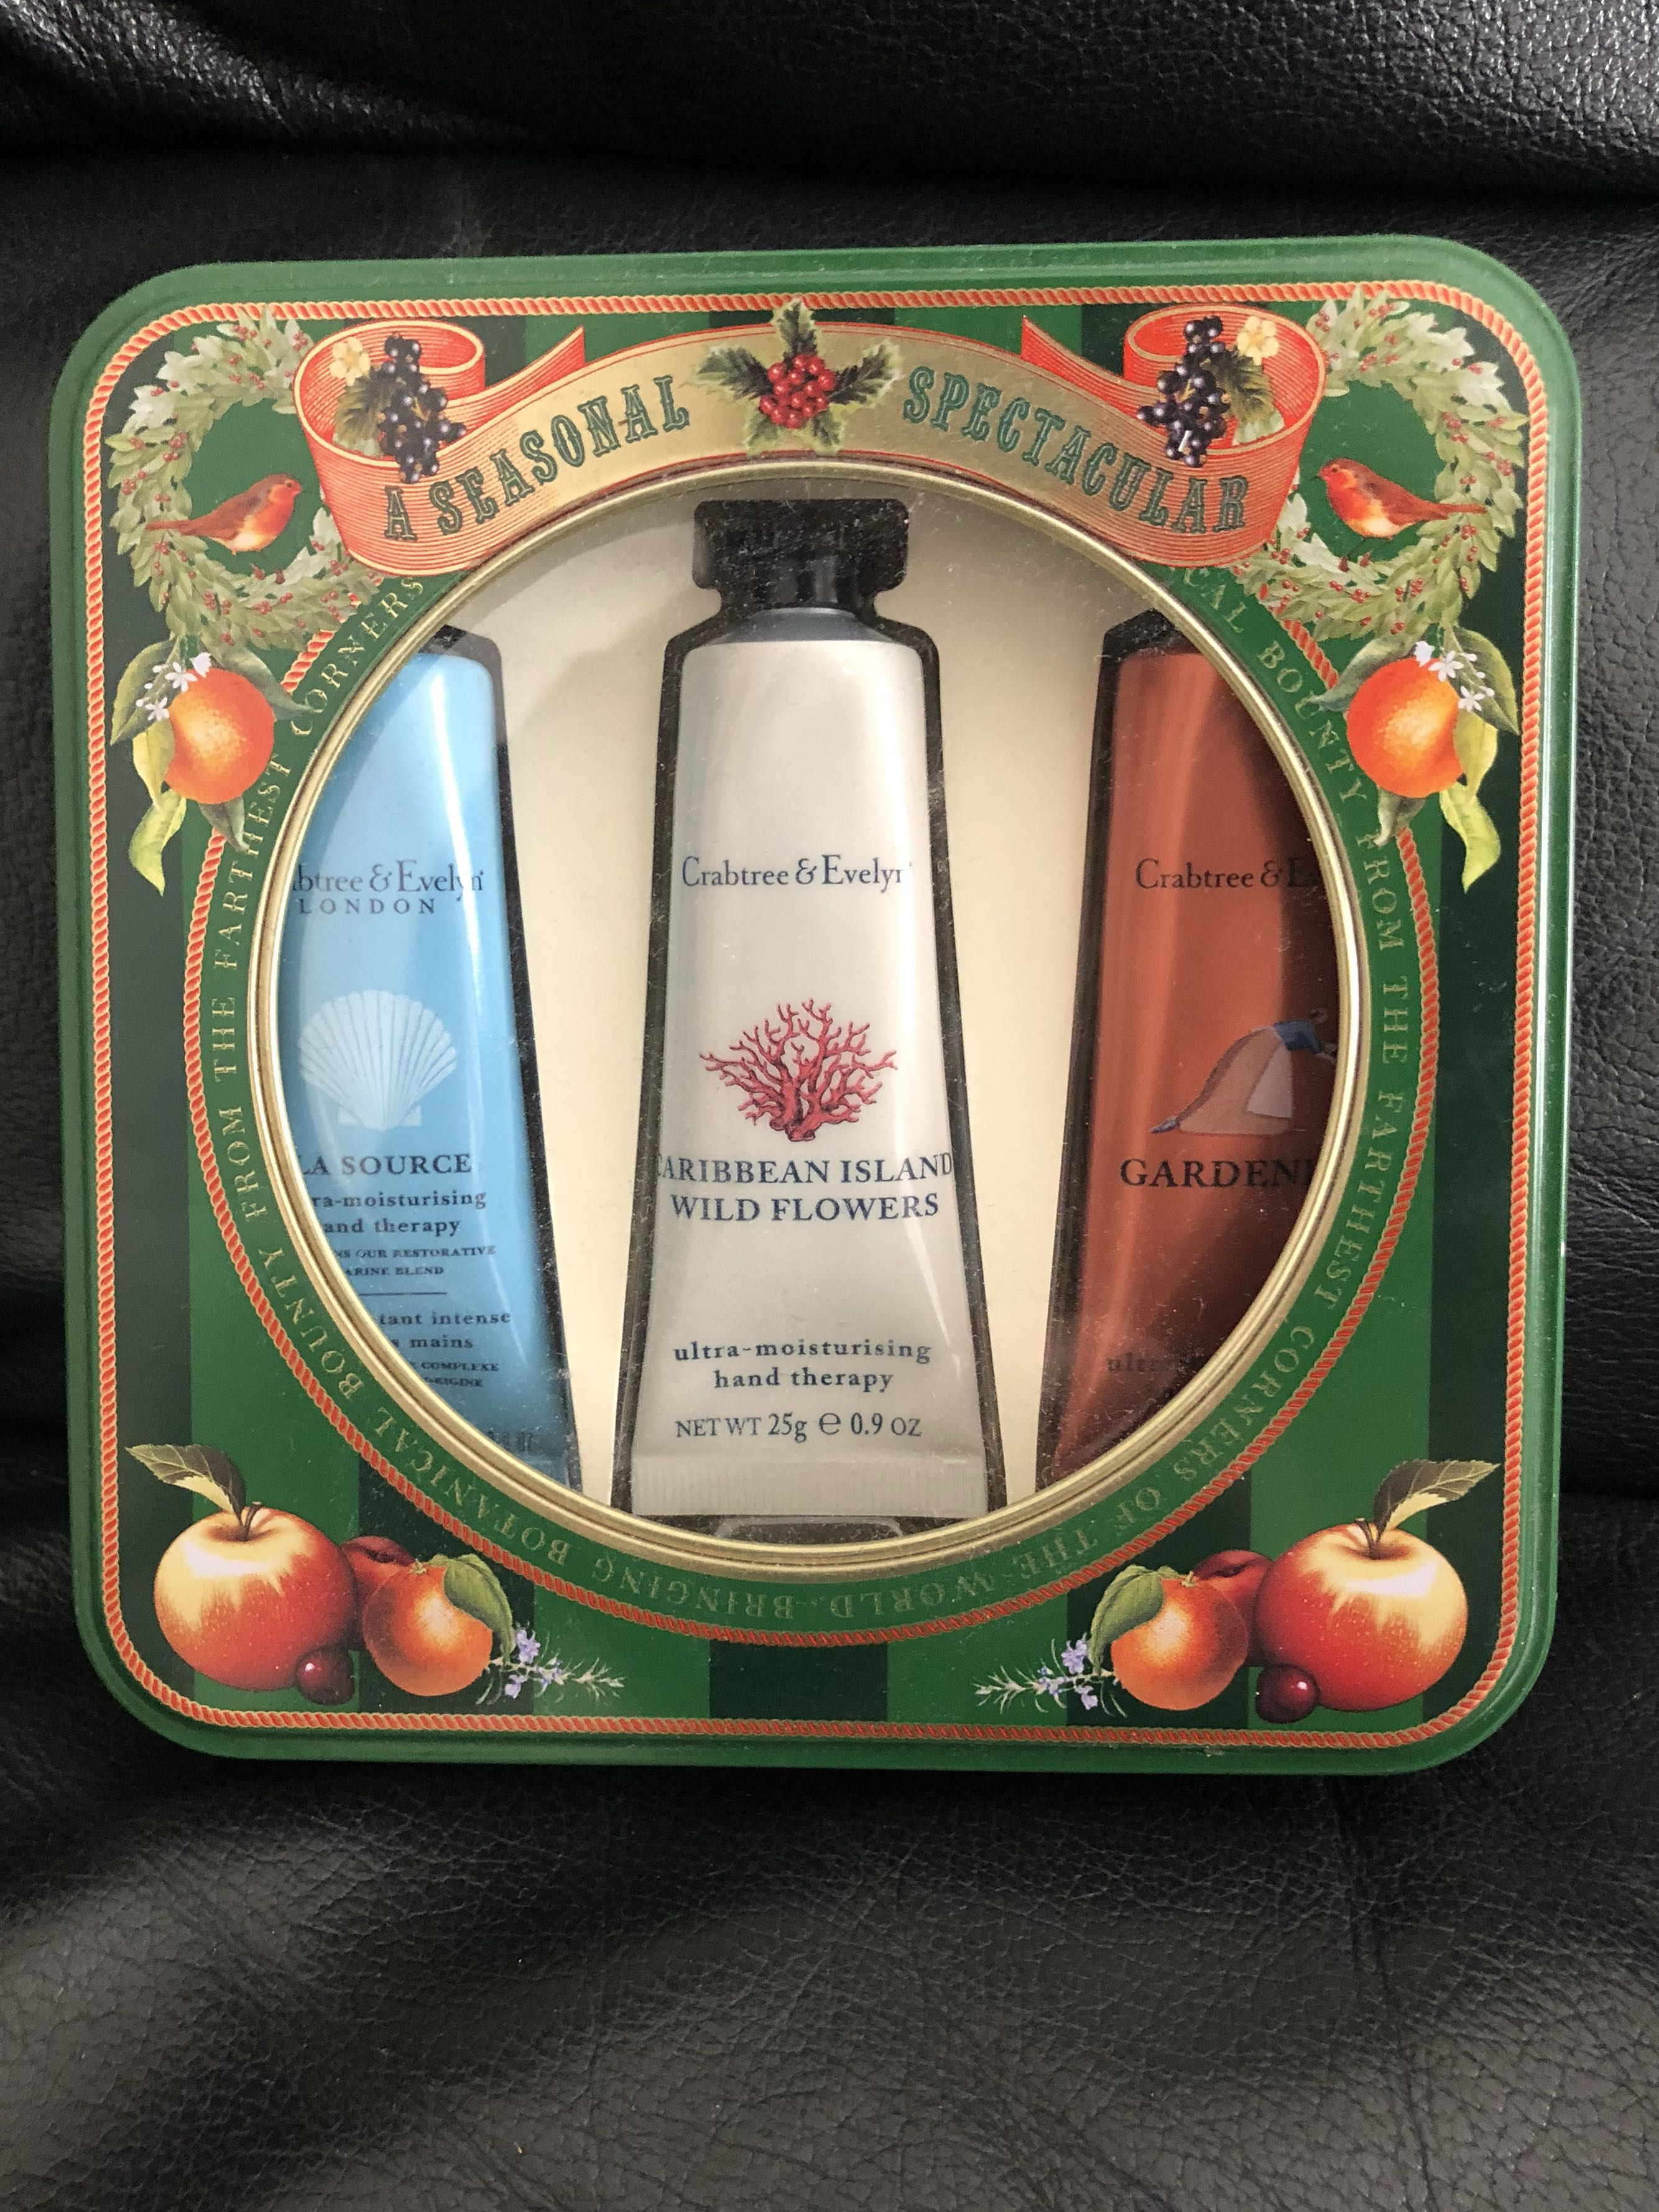 Crabtree & Evelyn hand cream gift set